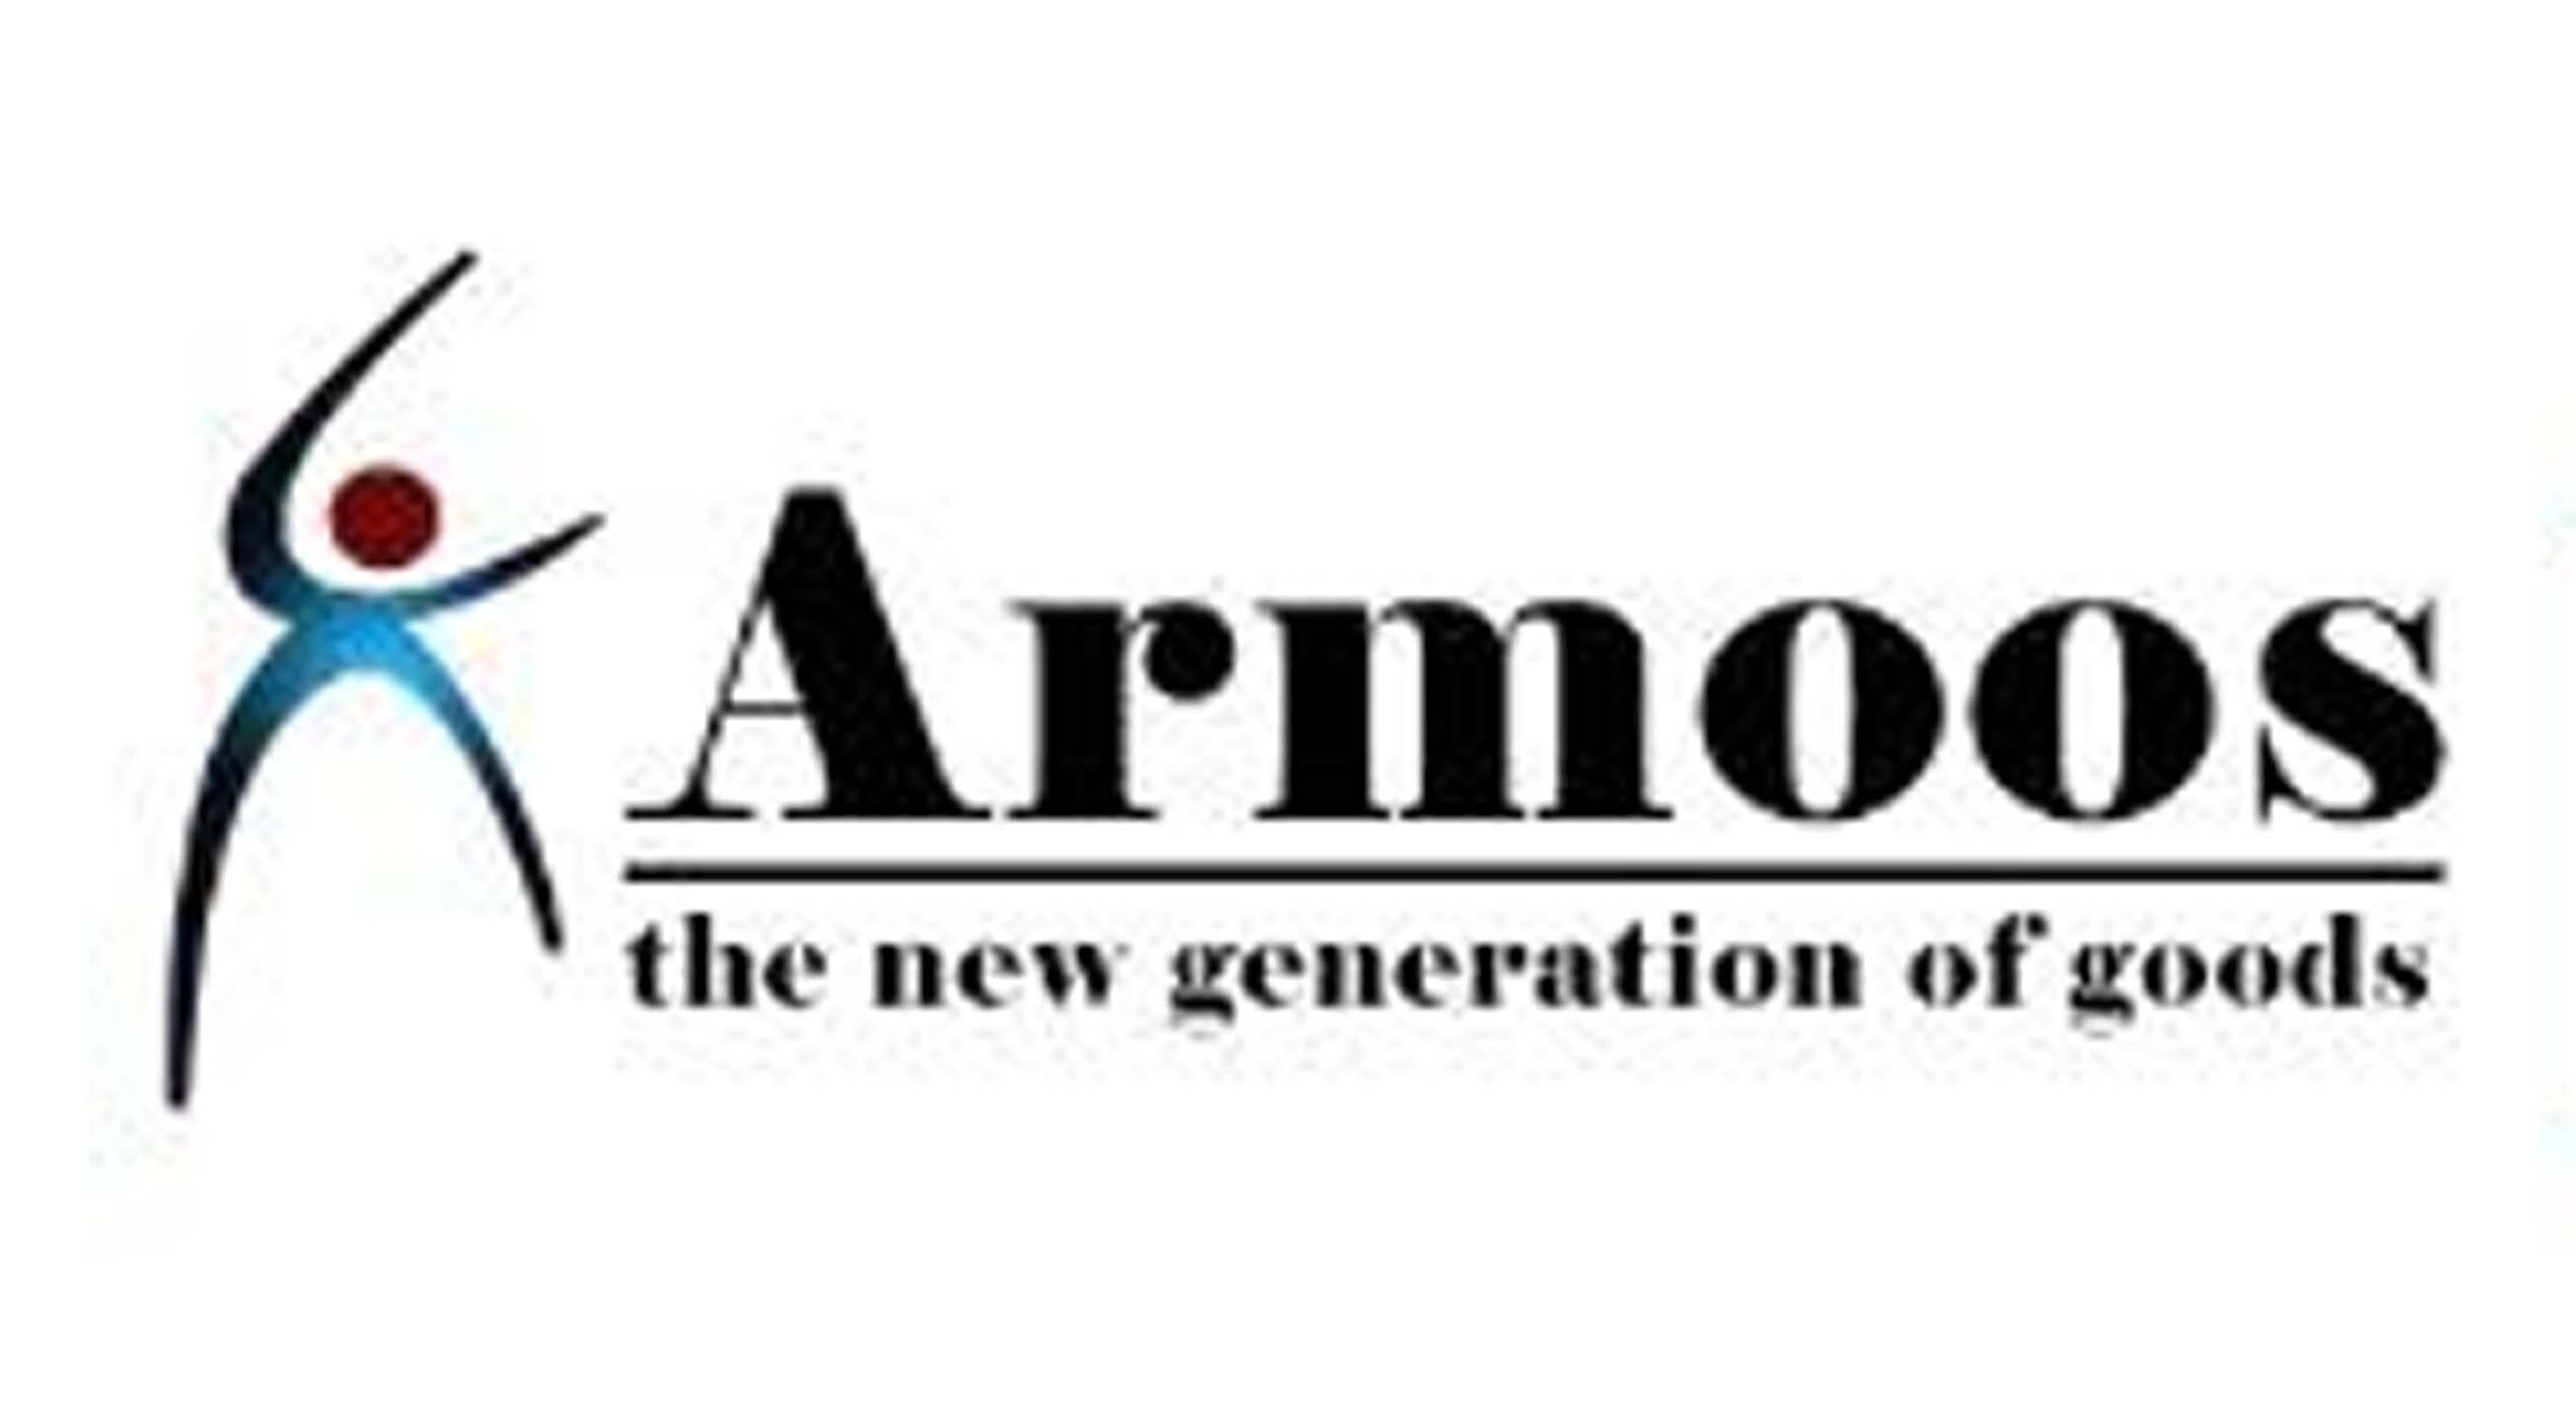 Armoos